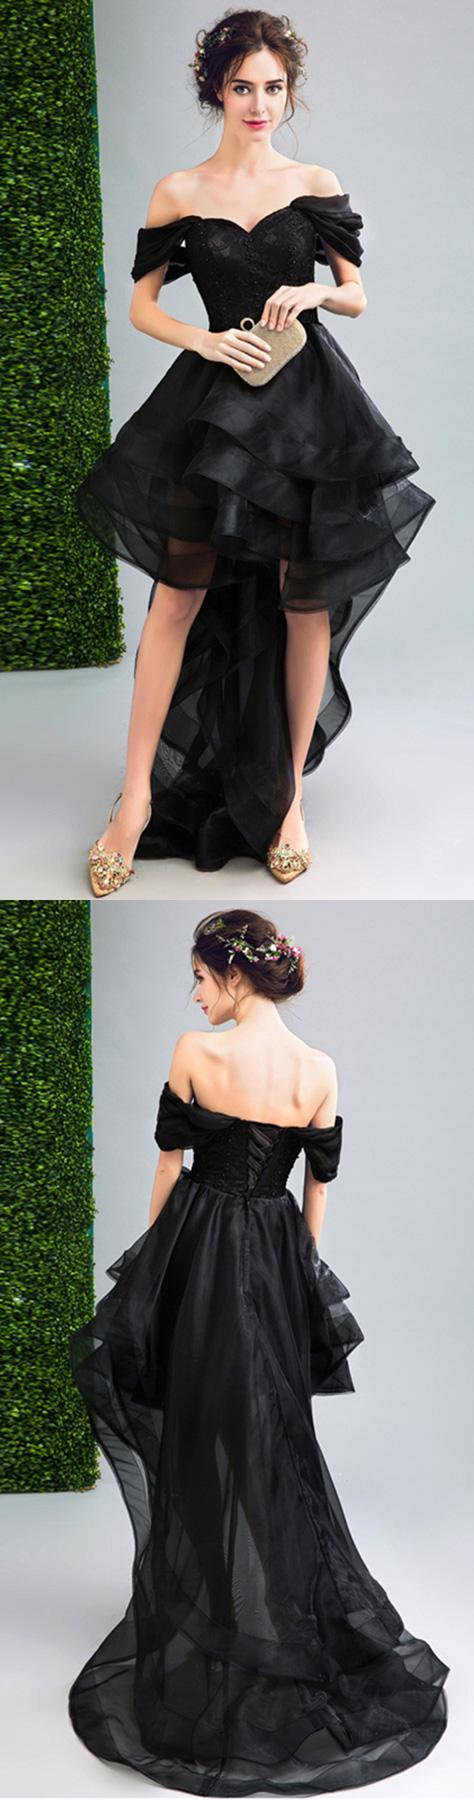 Black ballgown offtheshoulder high low organza formal dress with